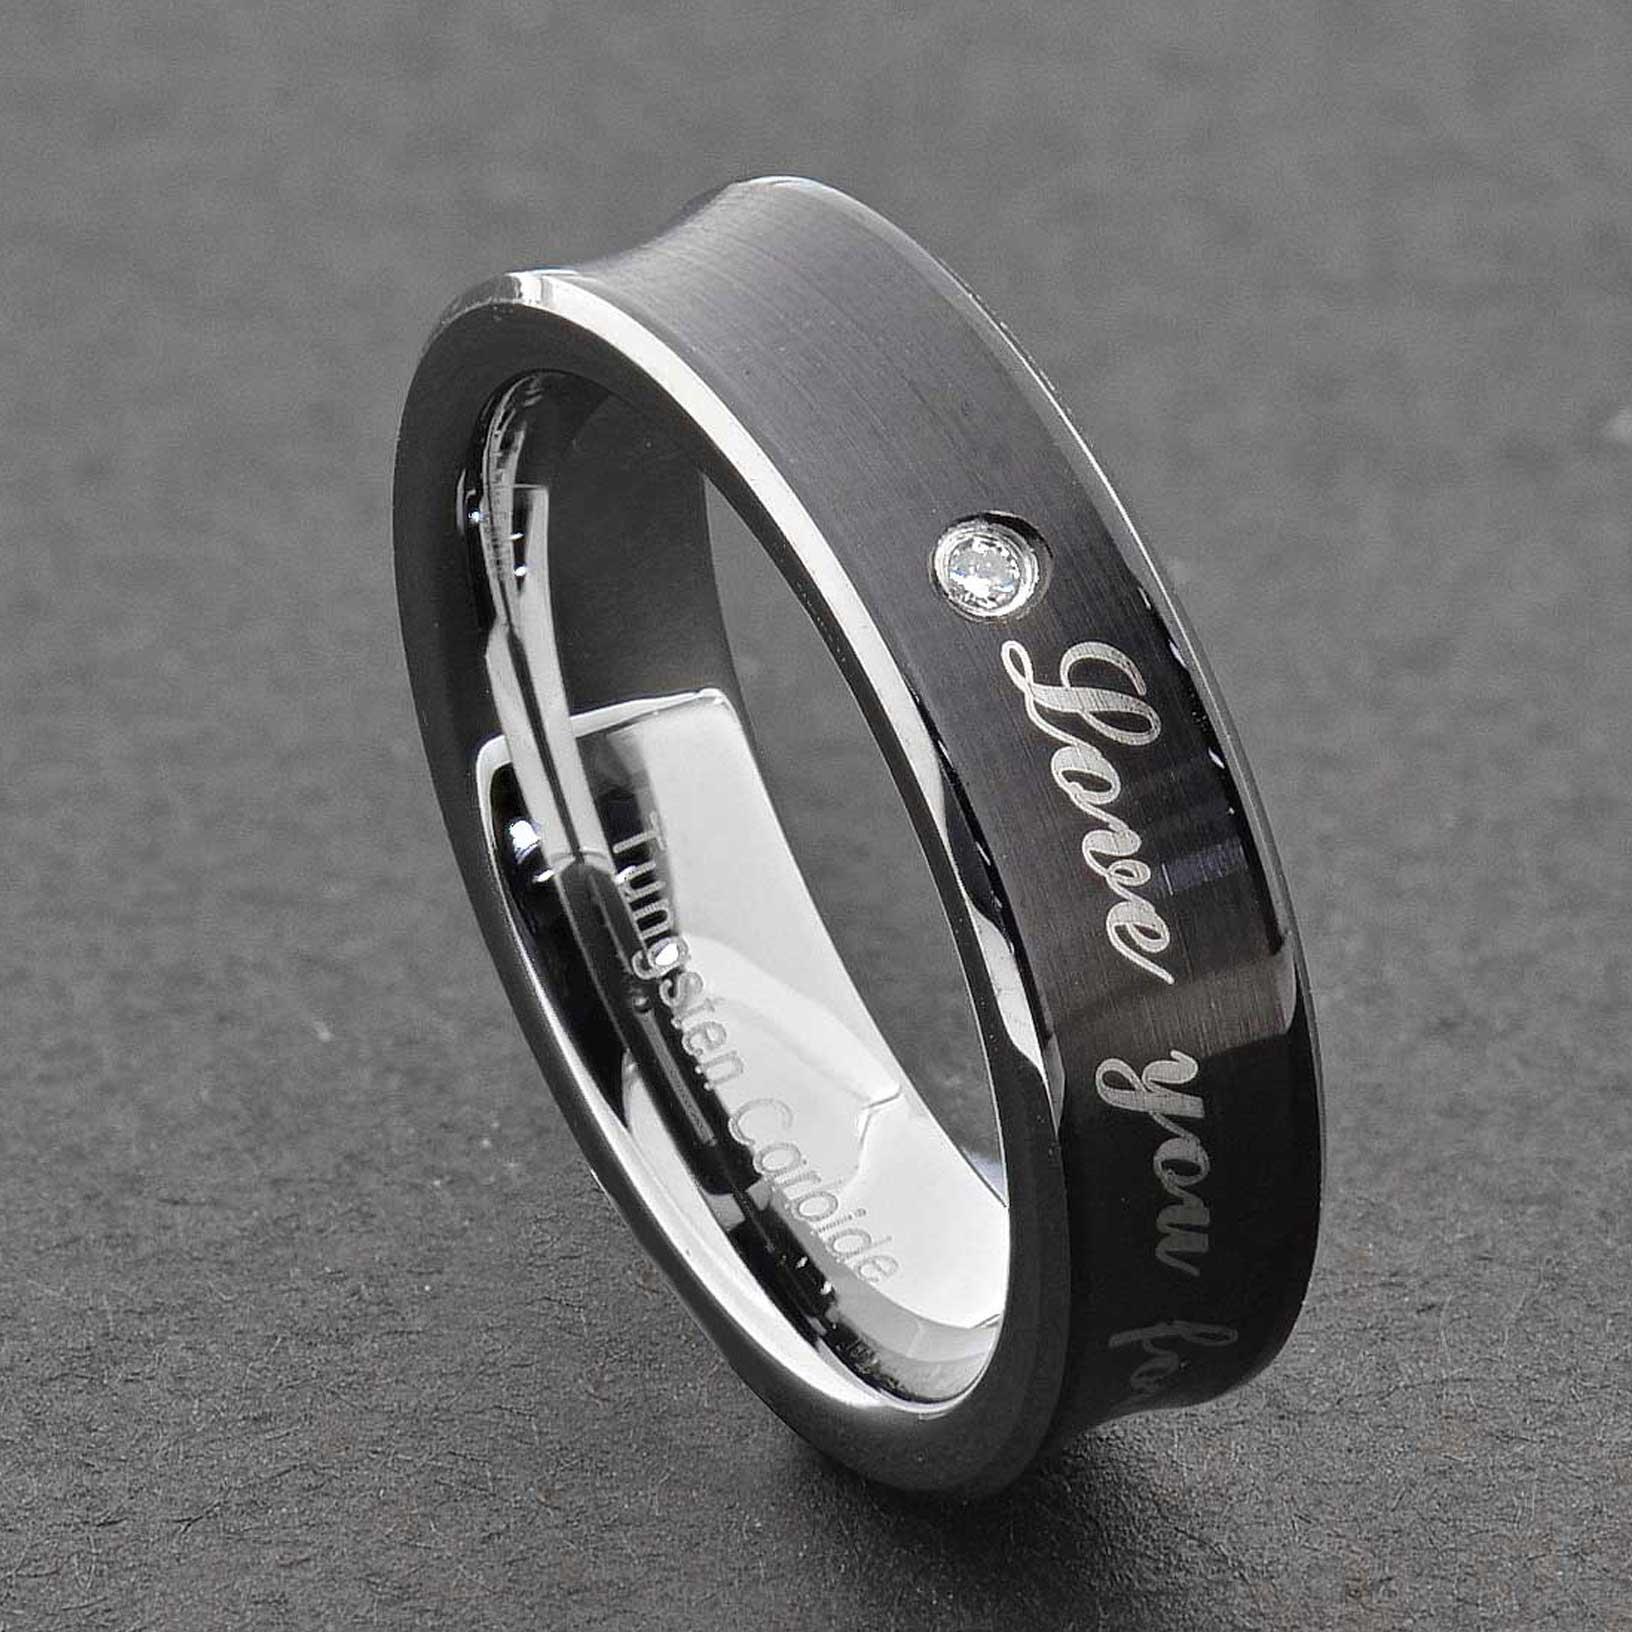 tungsten diamond men women wedding band ring black silver. Black Bedroom Furniture Sets. Home Design Ideas